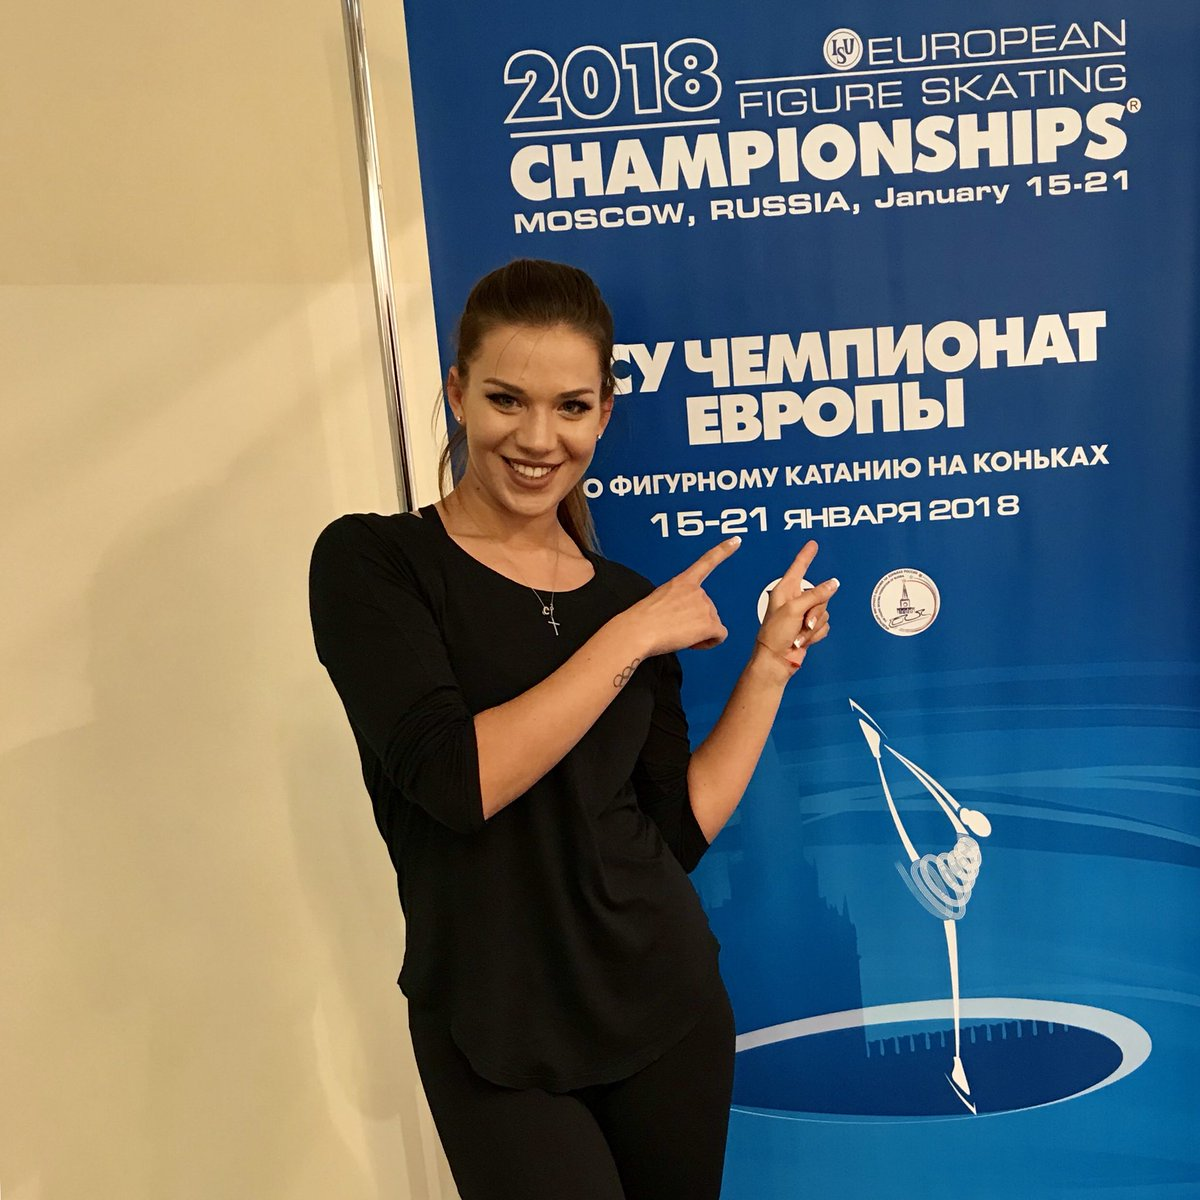 Алиса Агафонова - Альпер Учар / Alisa AGAFONONA - Alper UCAR TUR - Страница 3 DTllxESXkAA3gEU